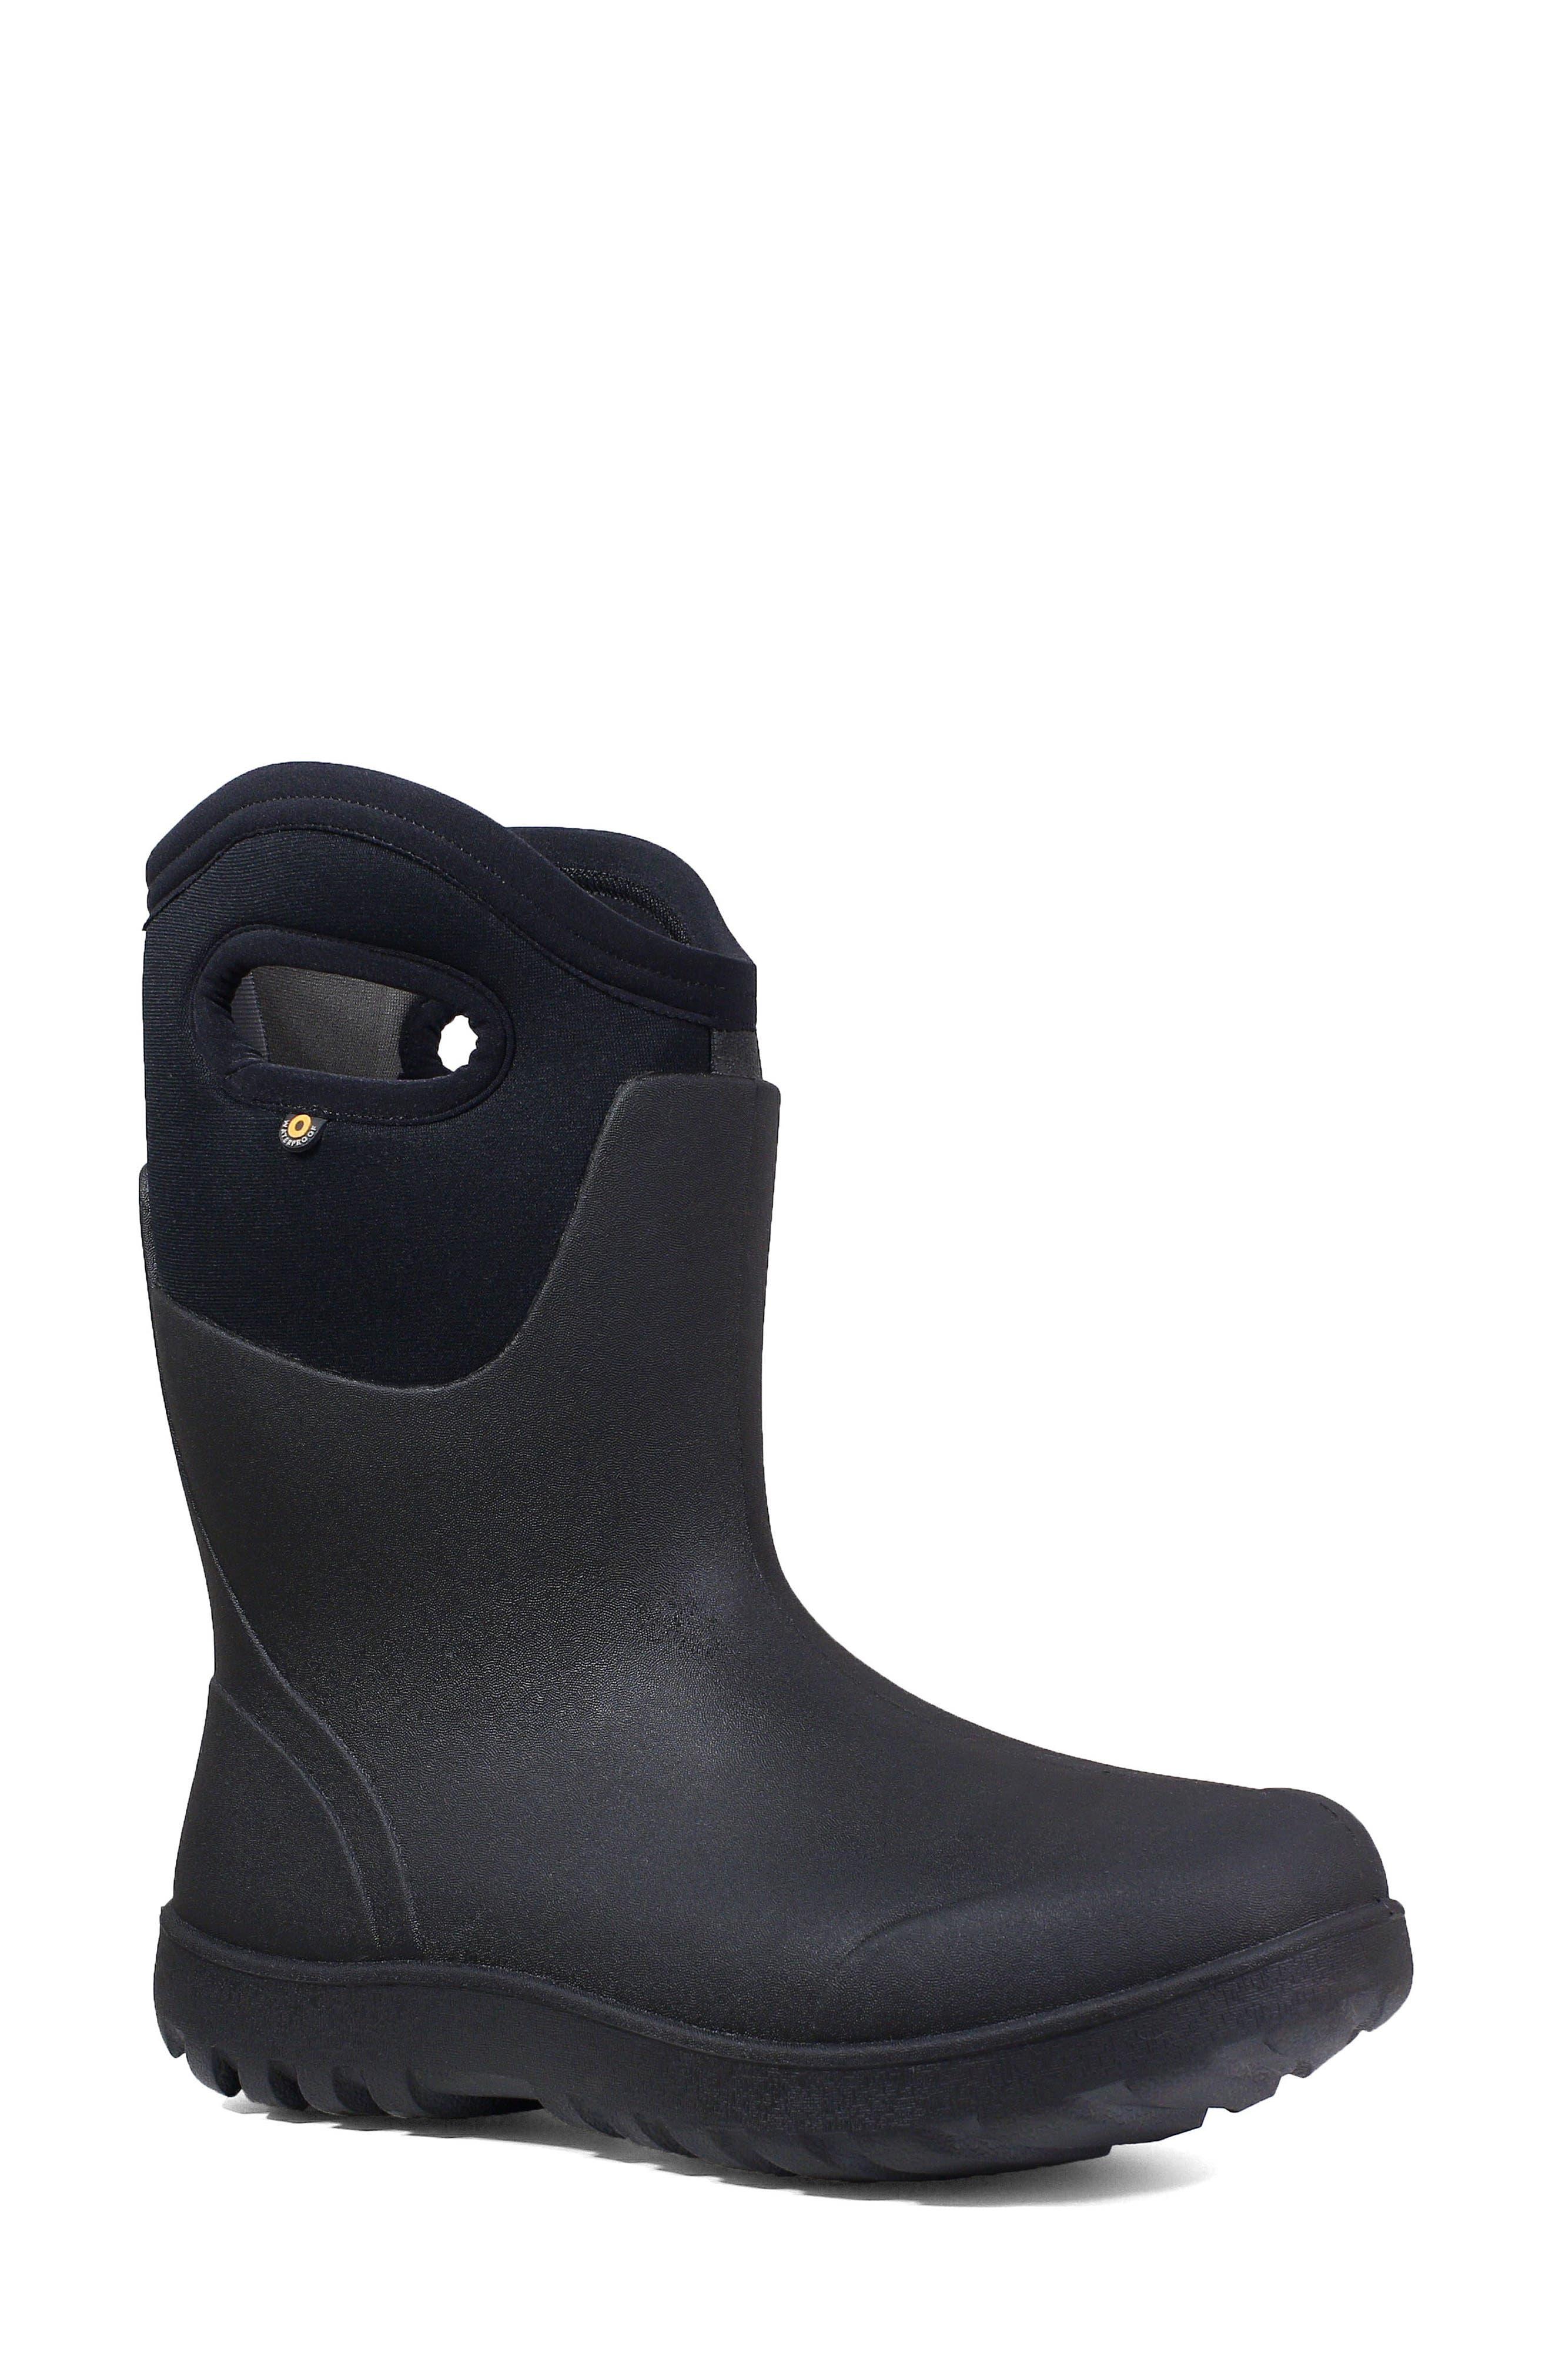 Neo Classic Mid Waterproof Rain Boot